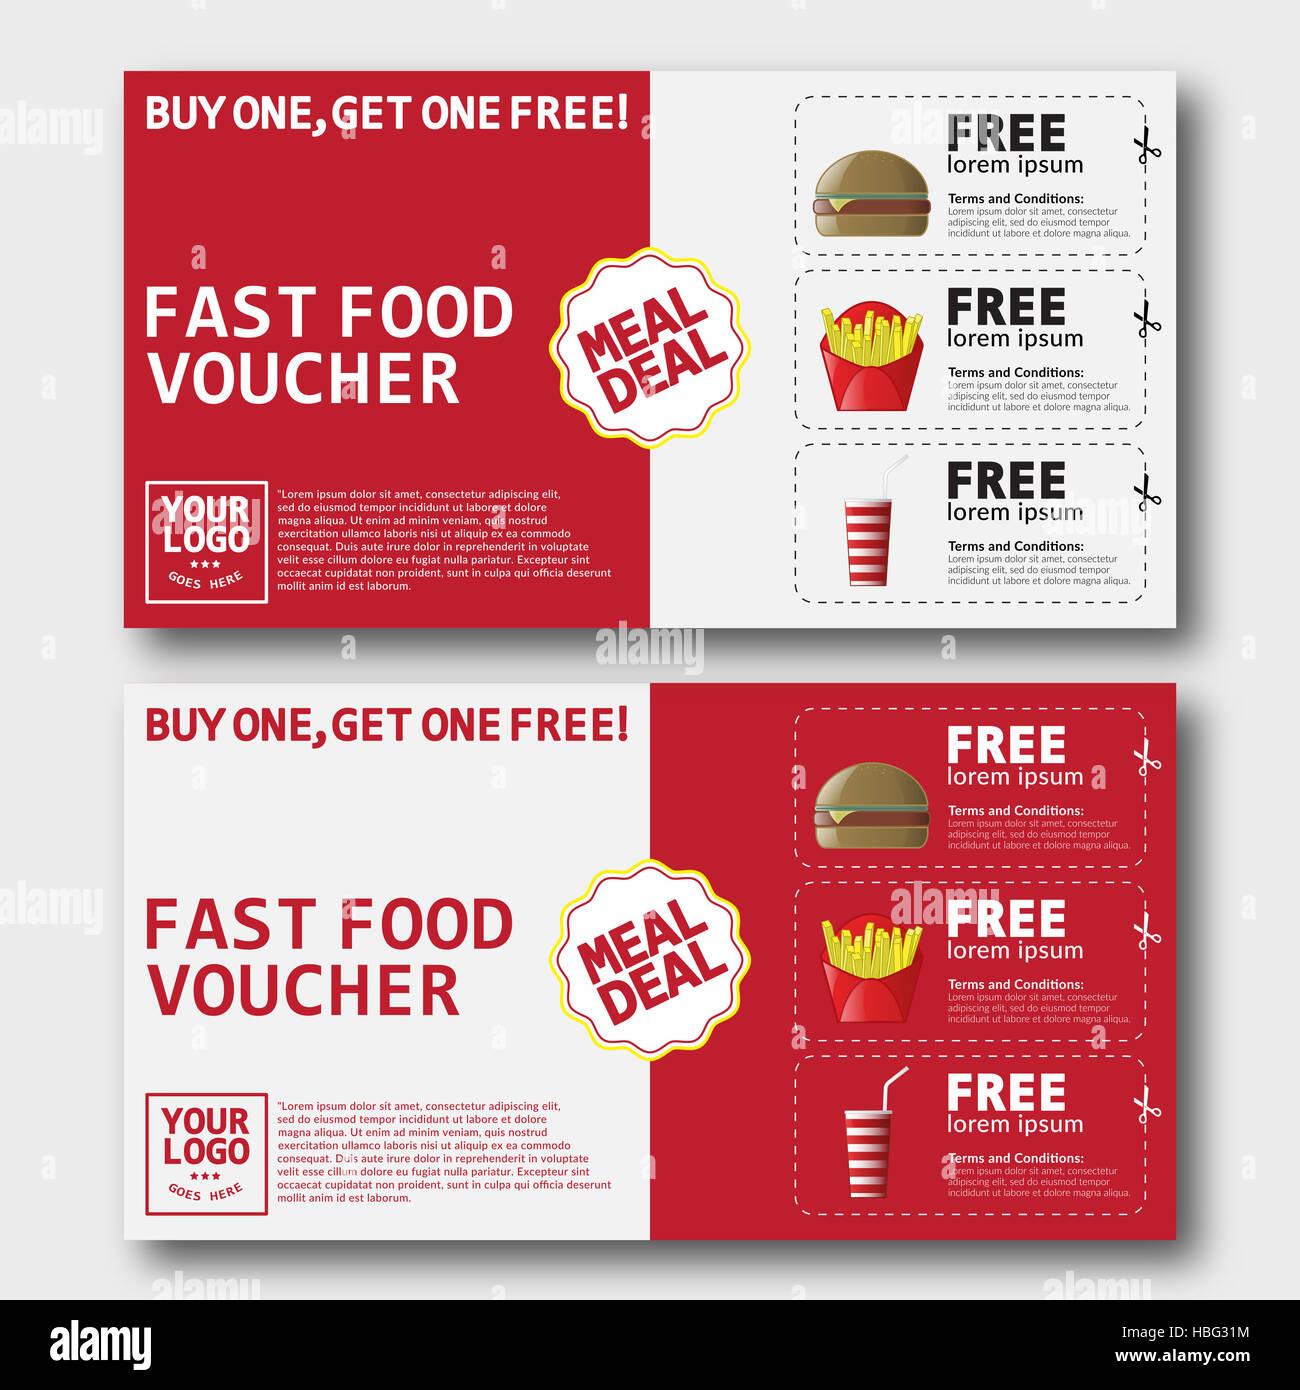 Fast Food Voucher Template